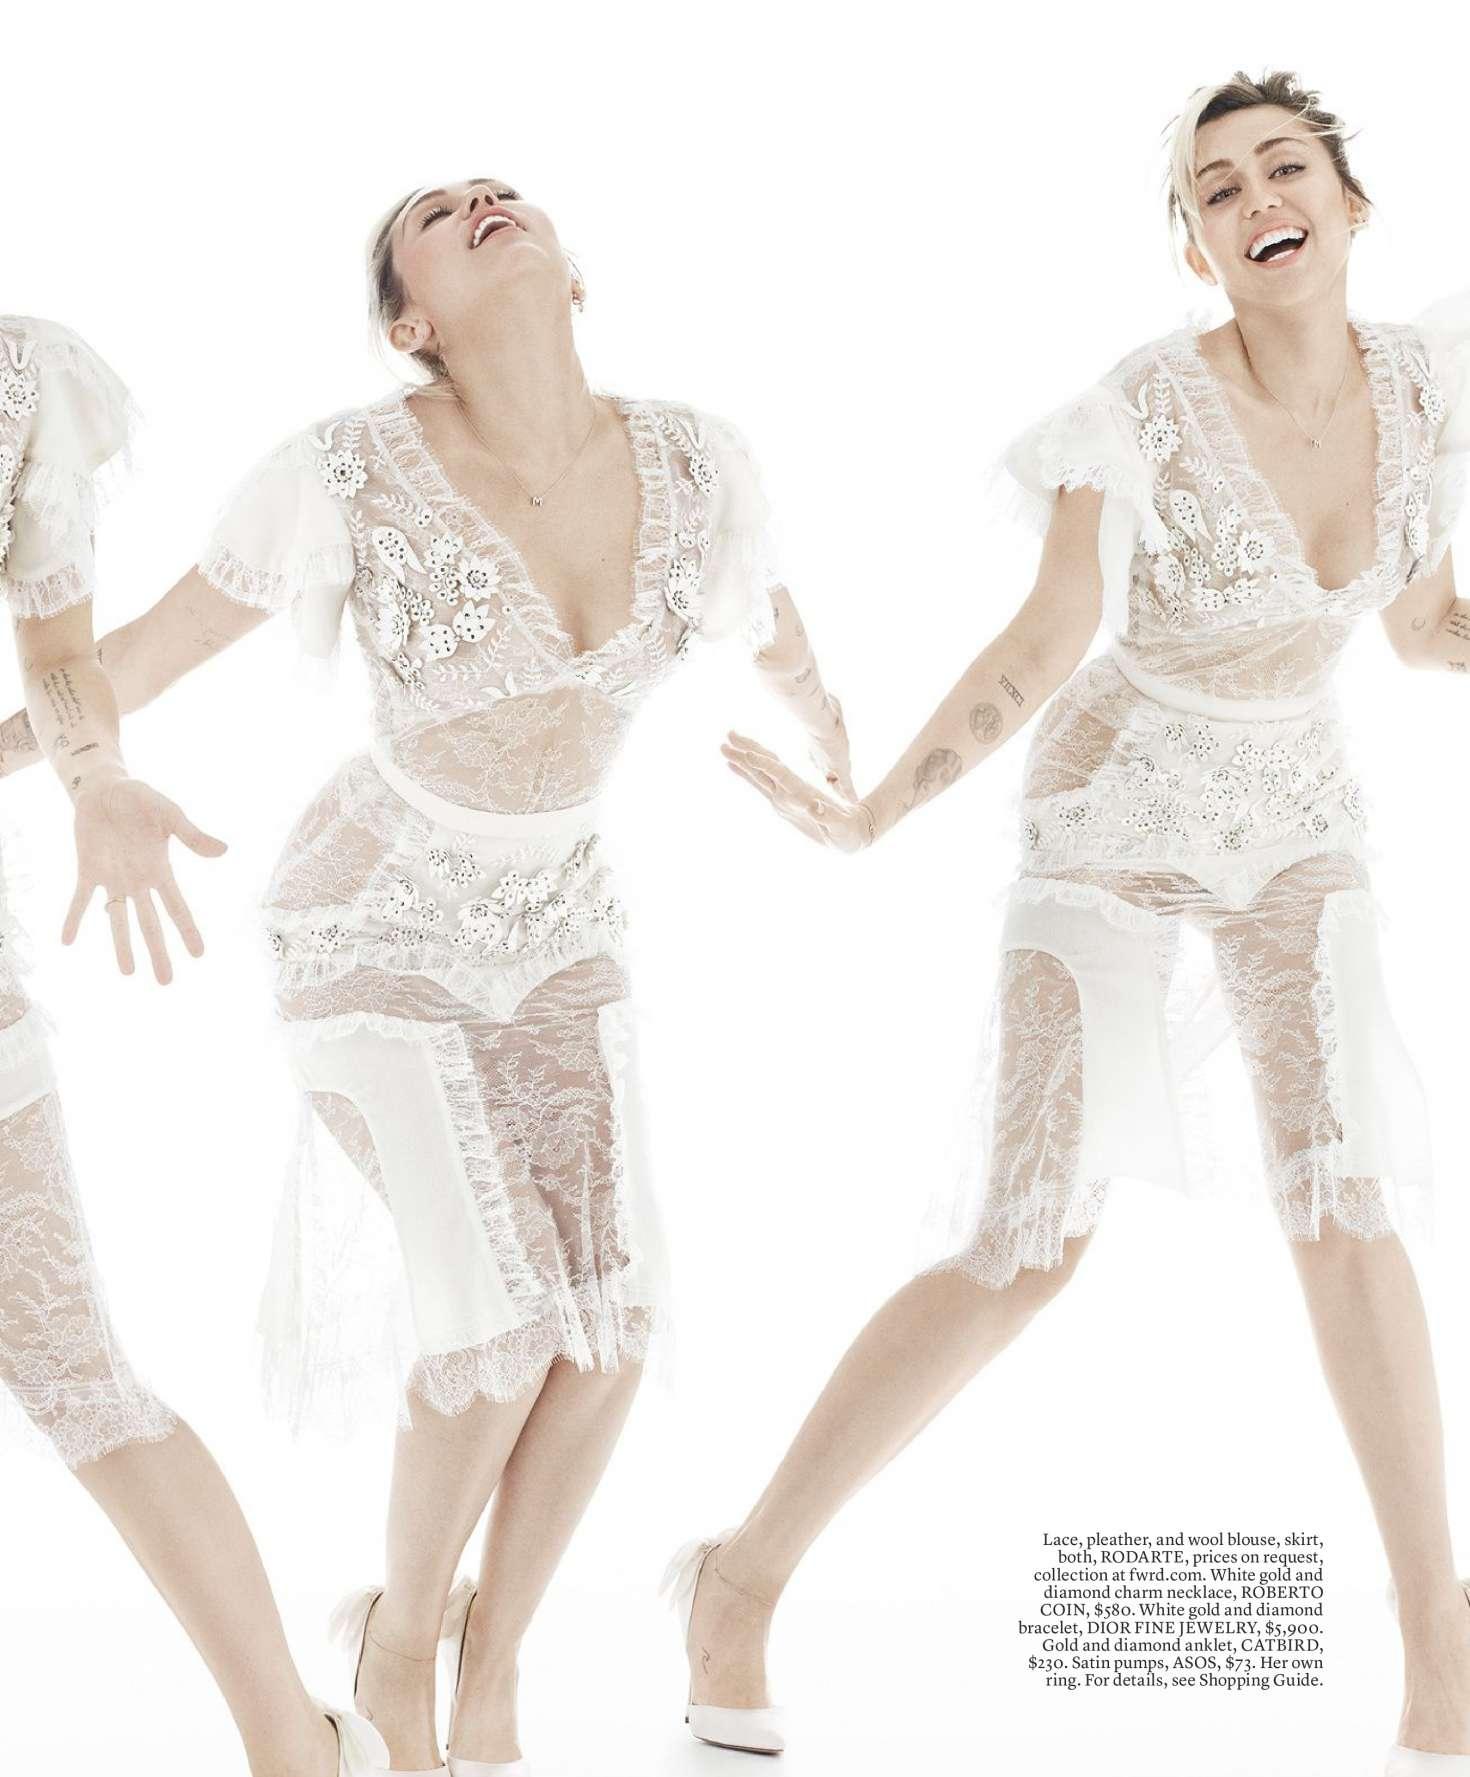 Miley Cyrus 2016 : Miley Cyrus: Elle Magazine 2016 -18